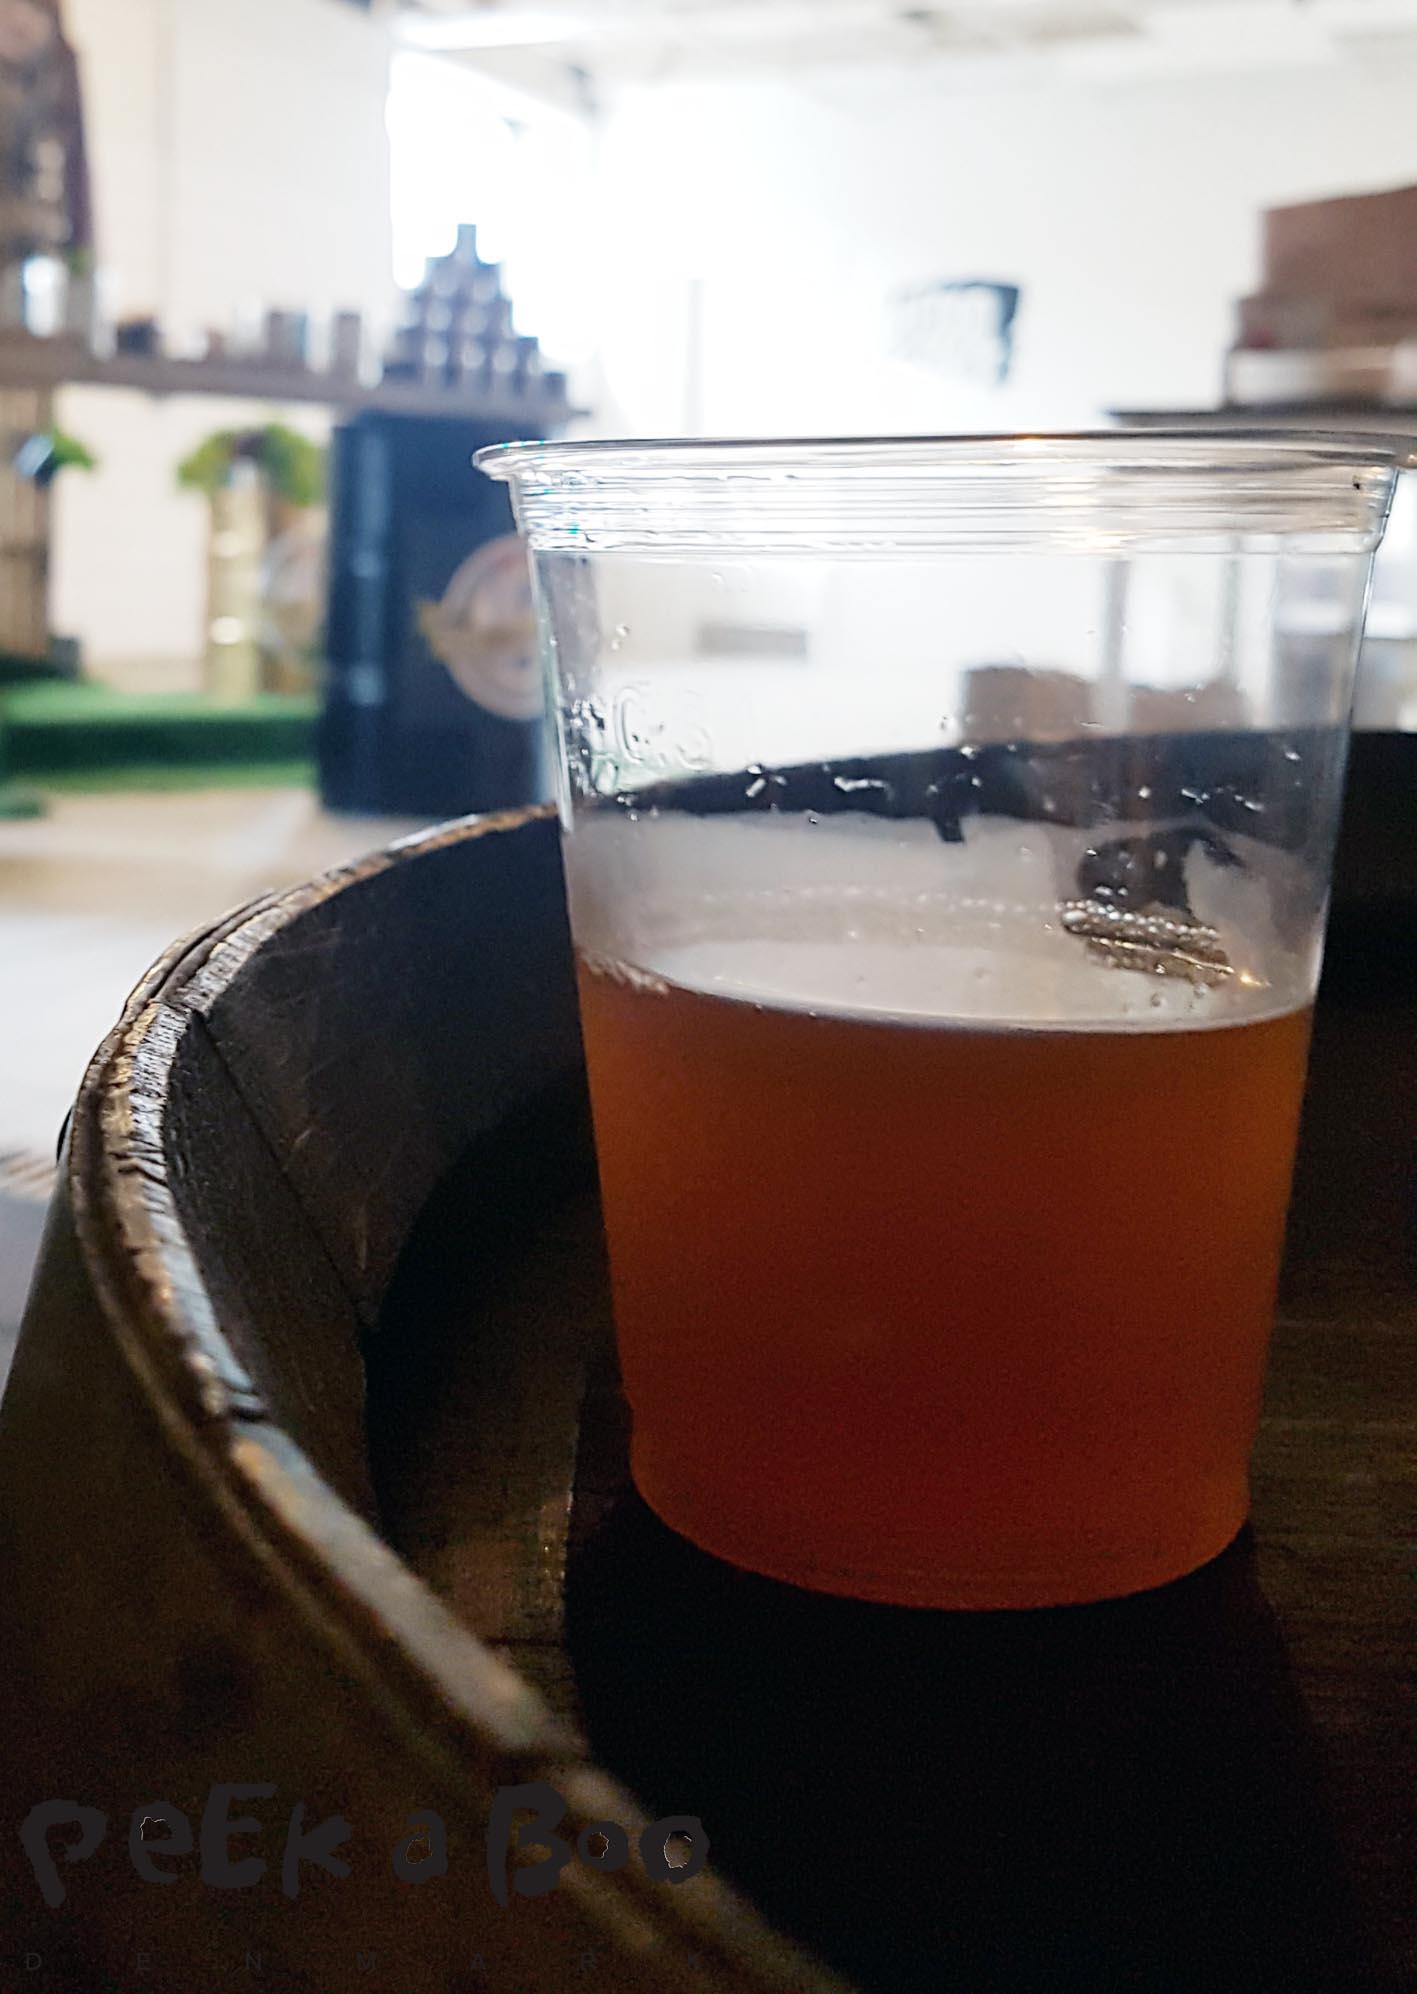 Dette år øko øl brygget til Roskilde festivallen hedder orange 17, og er fra Jacobsen.